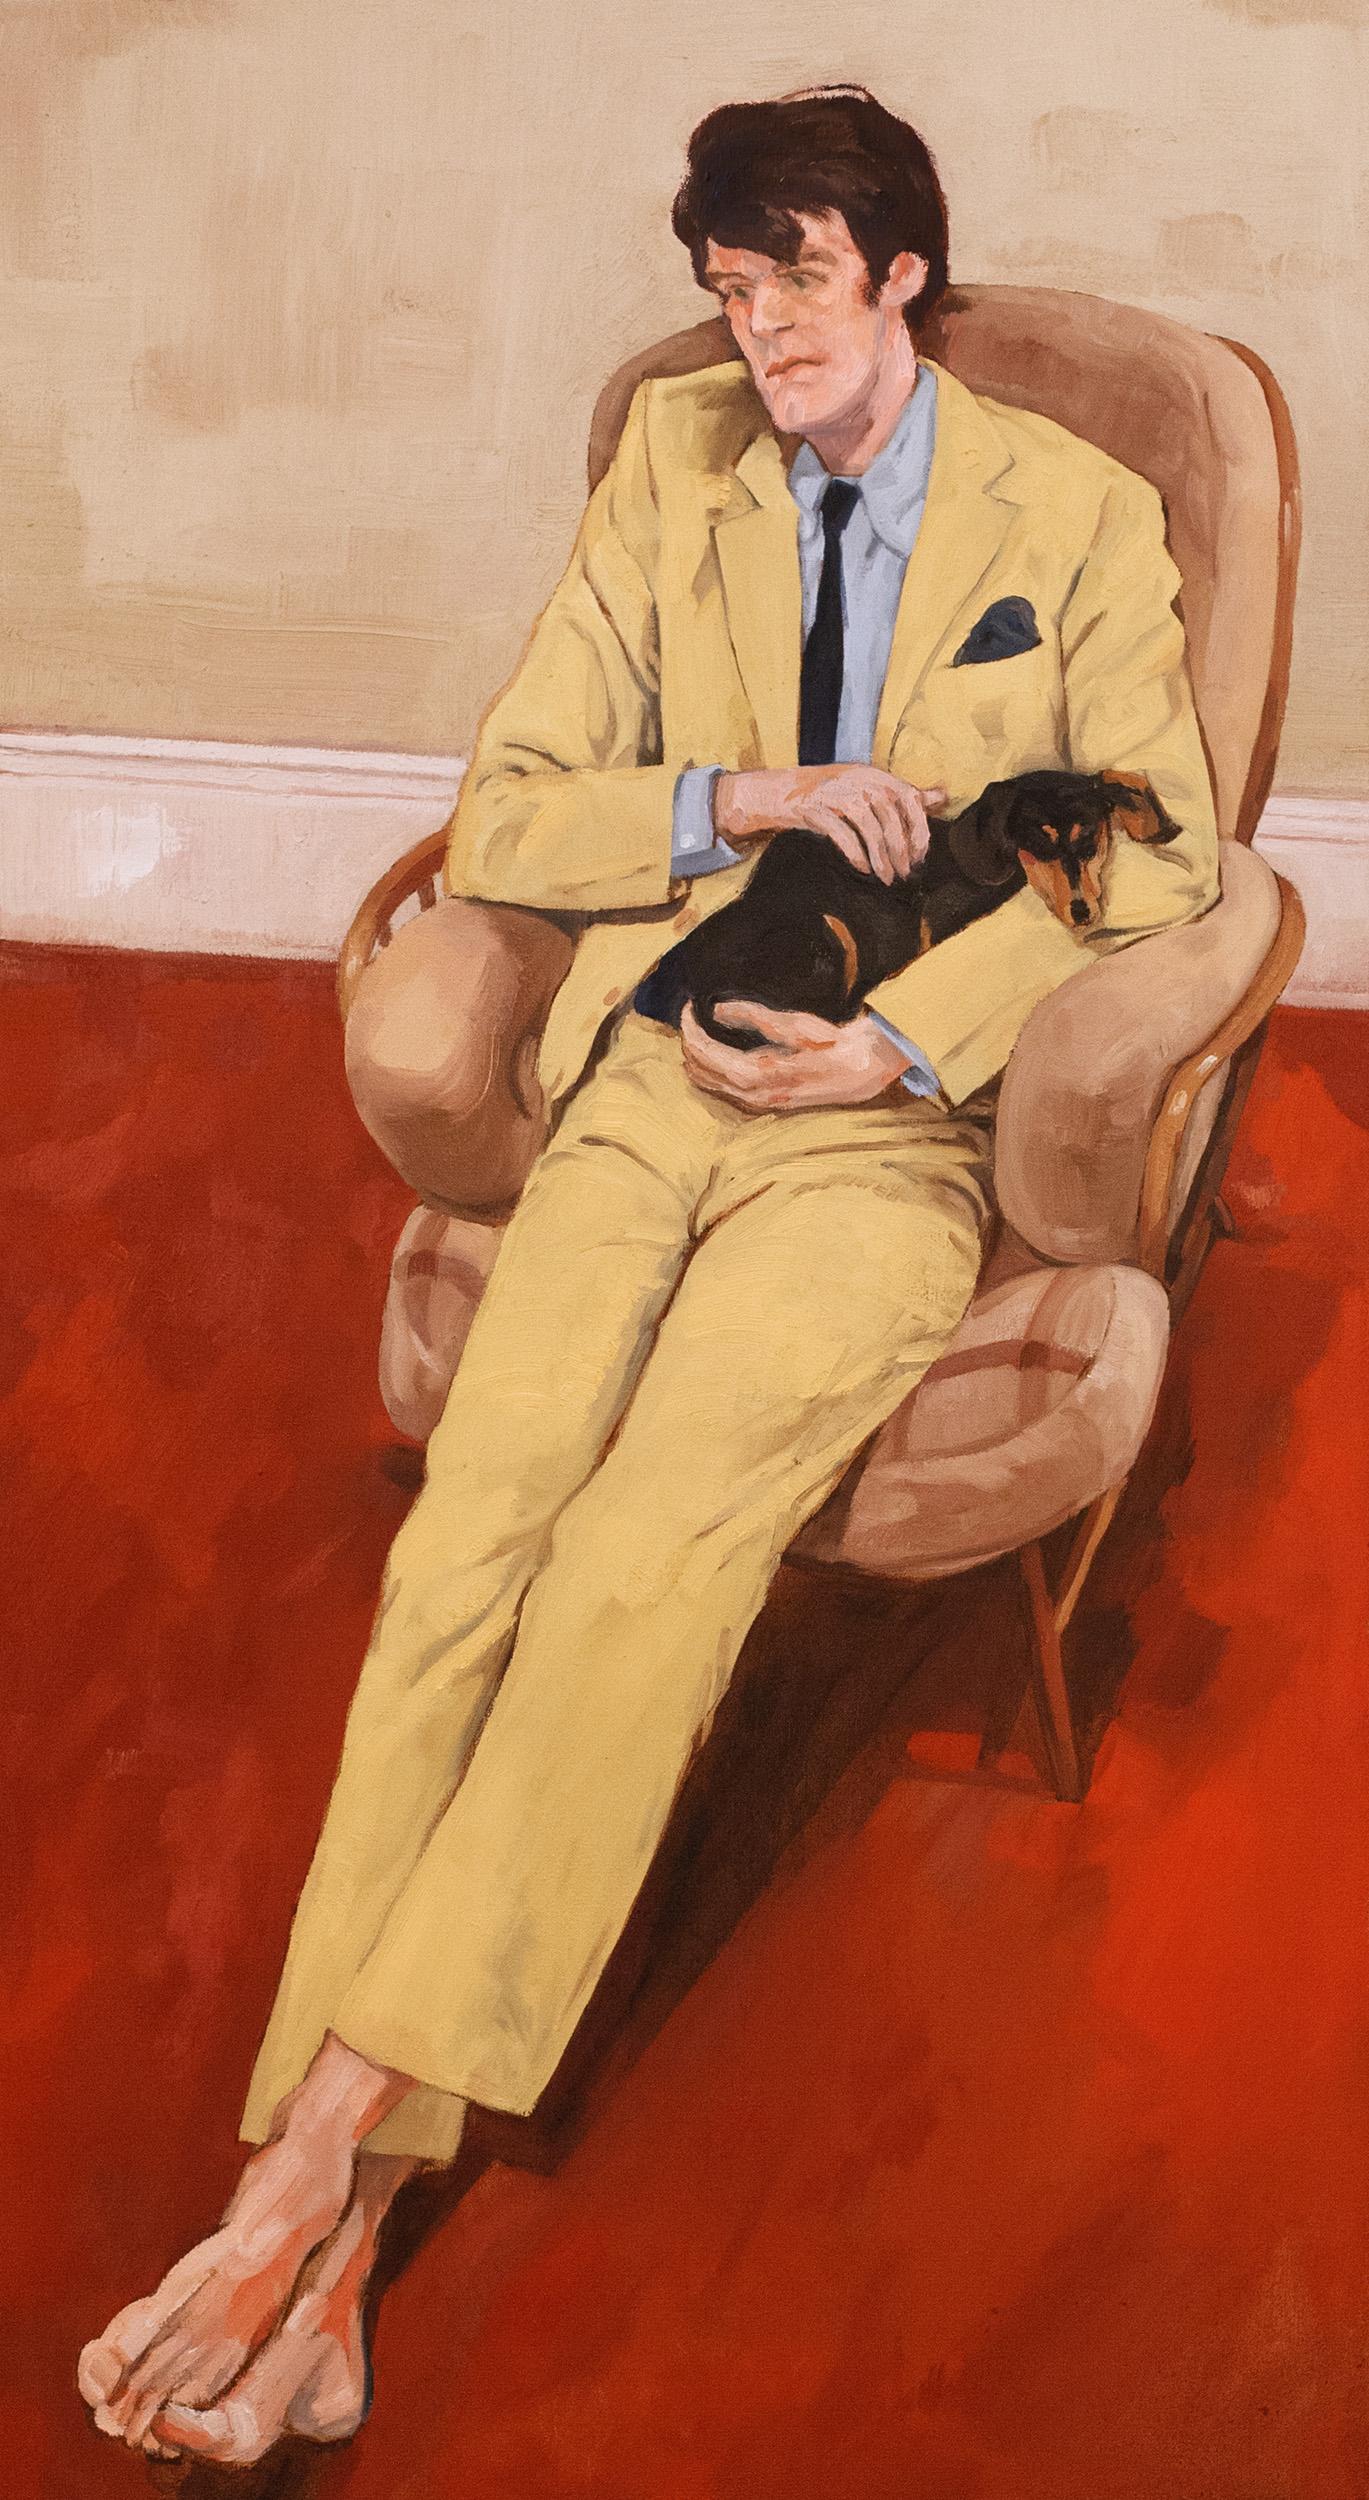 ROSS MCAULEY, Self-portrait with Cleo